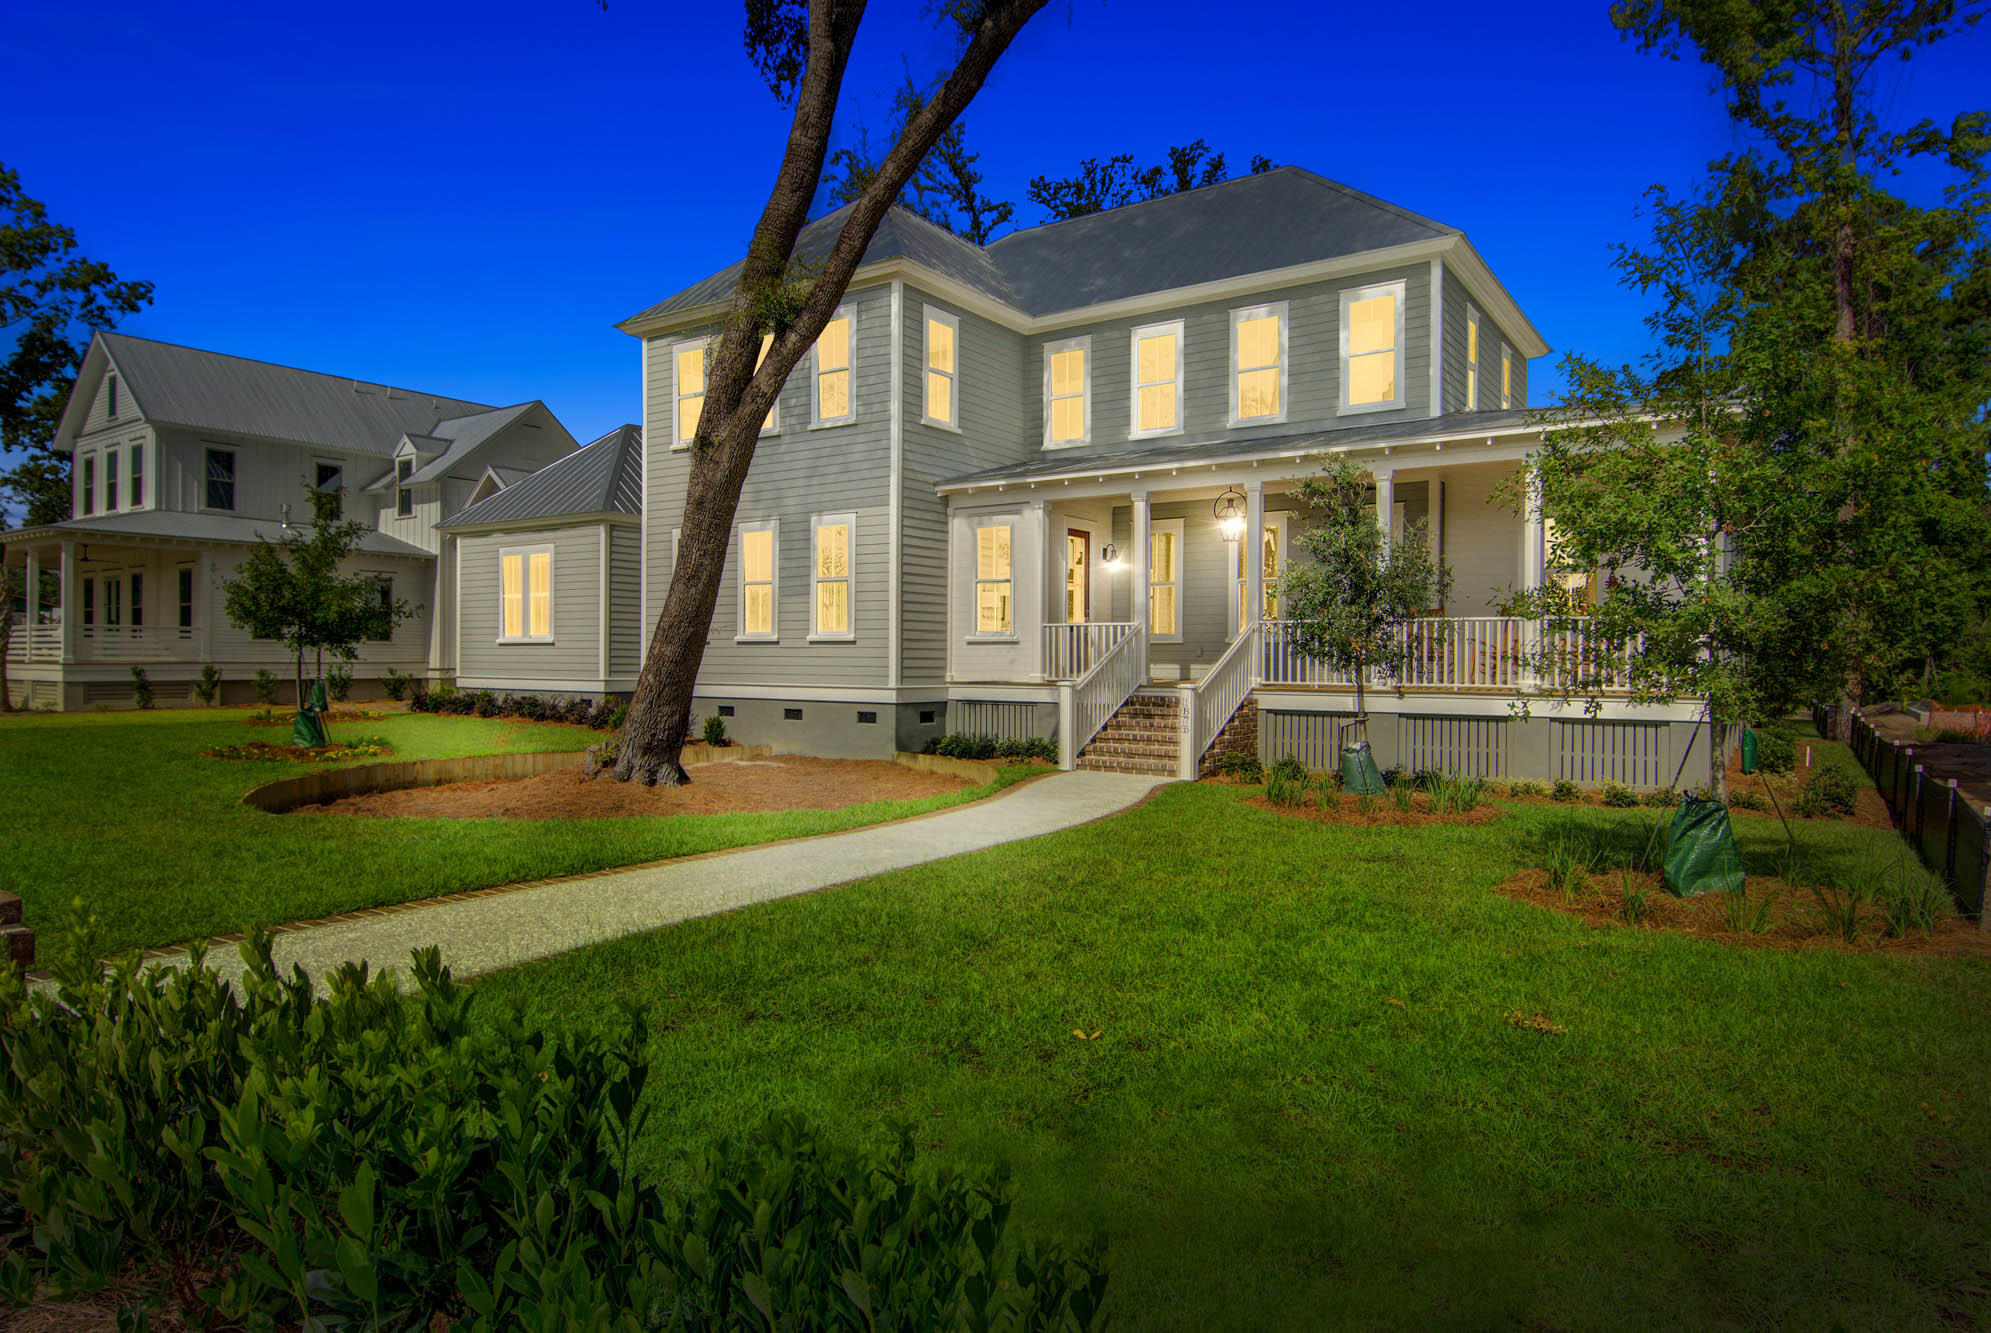 Carolina Park Homes For Sale - 1875 Bolden, Mount Pleasant, SC - 25